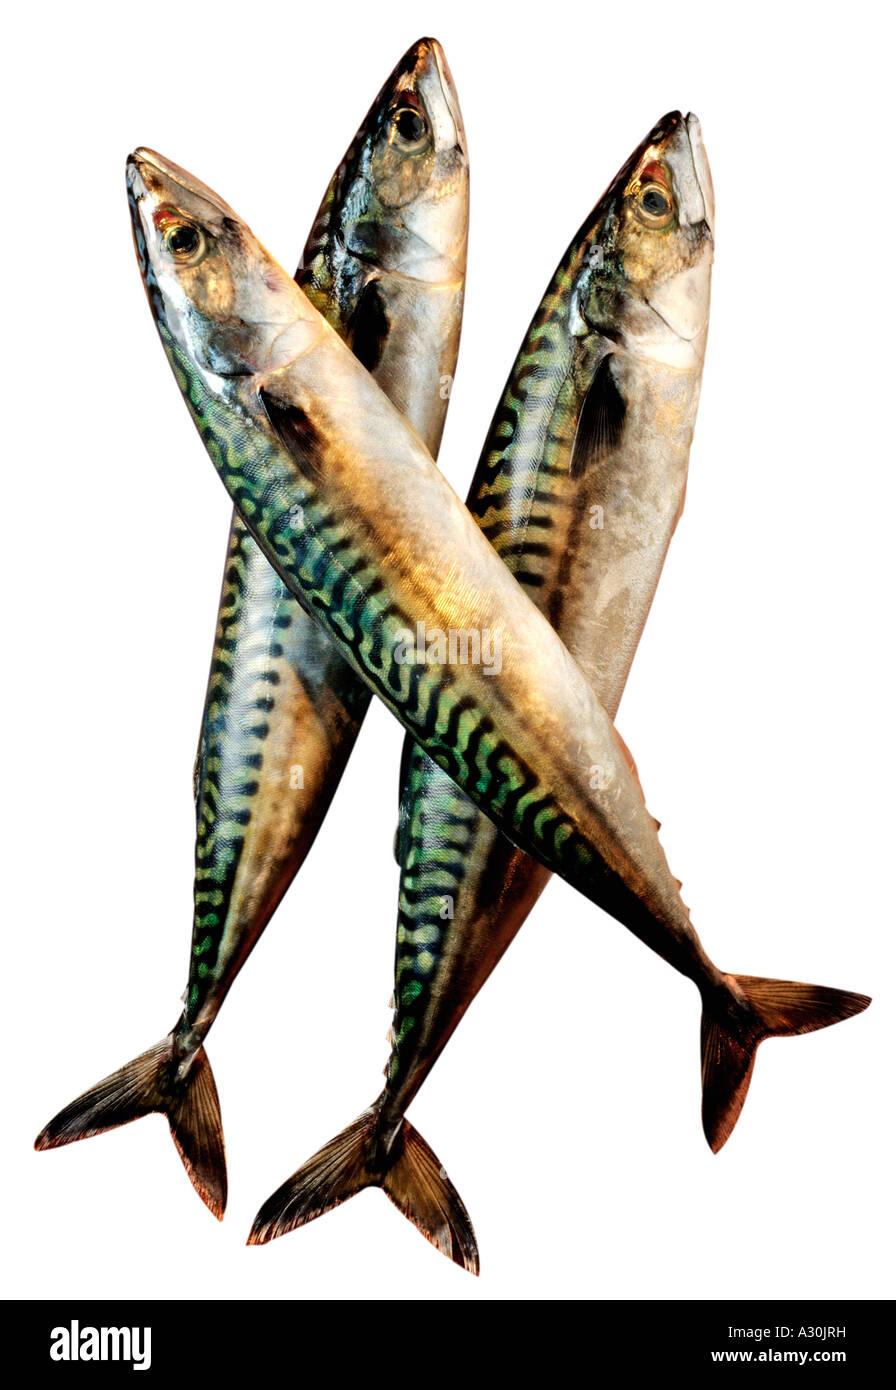 three fresh mackerel fish cut out stock photo royalty free image